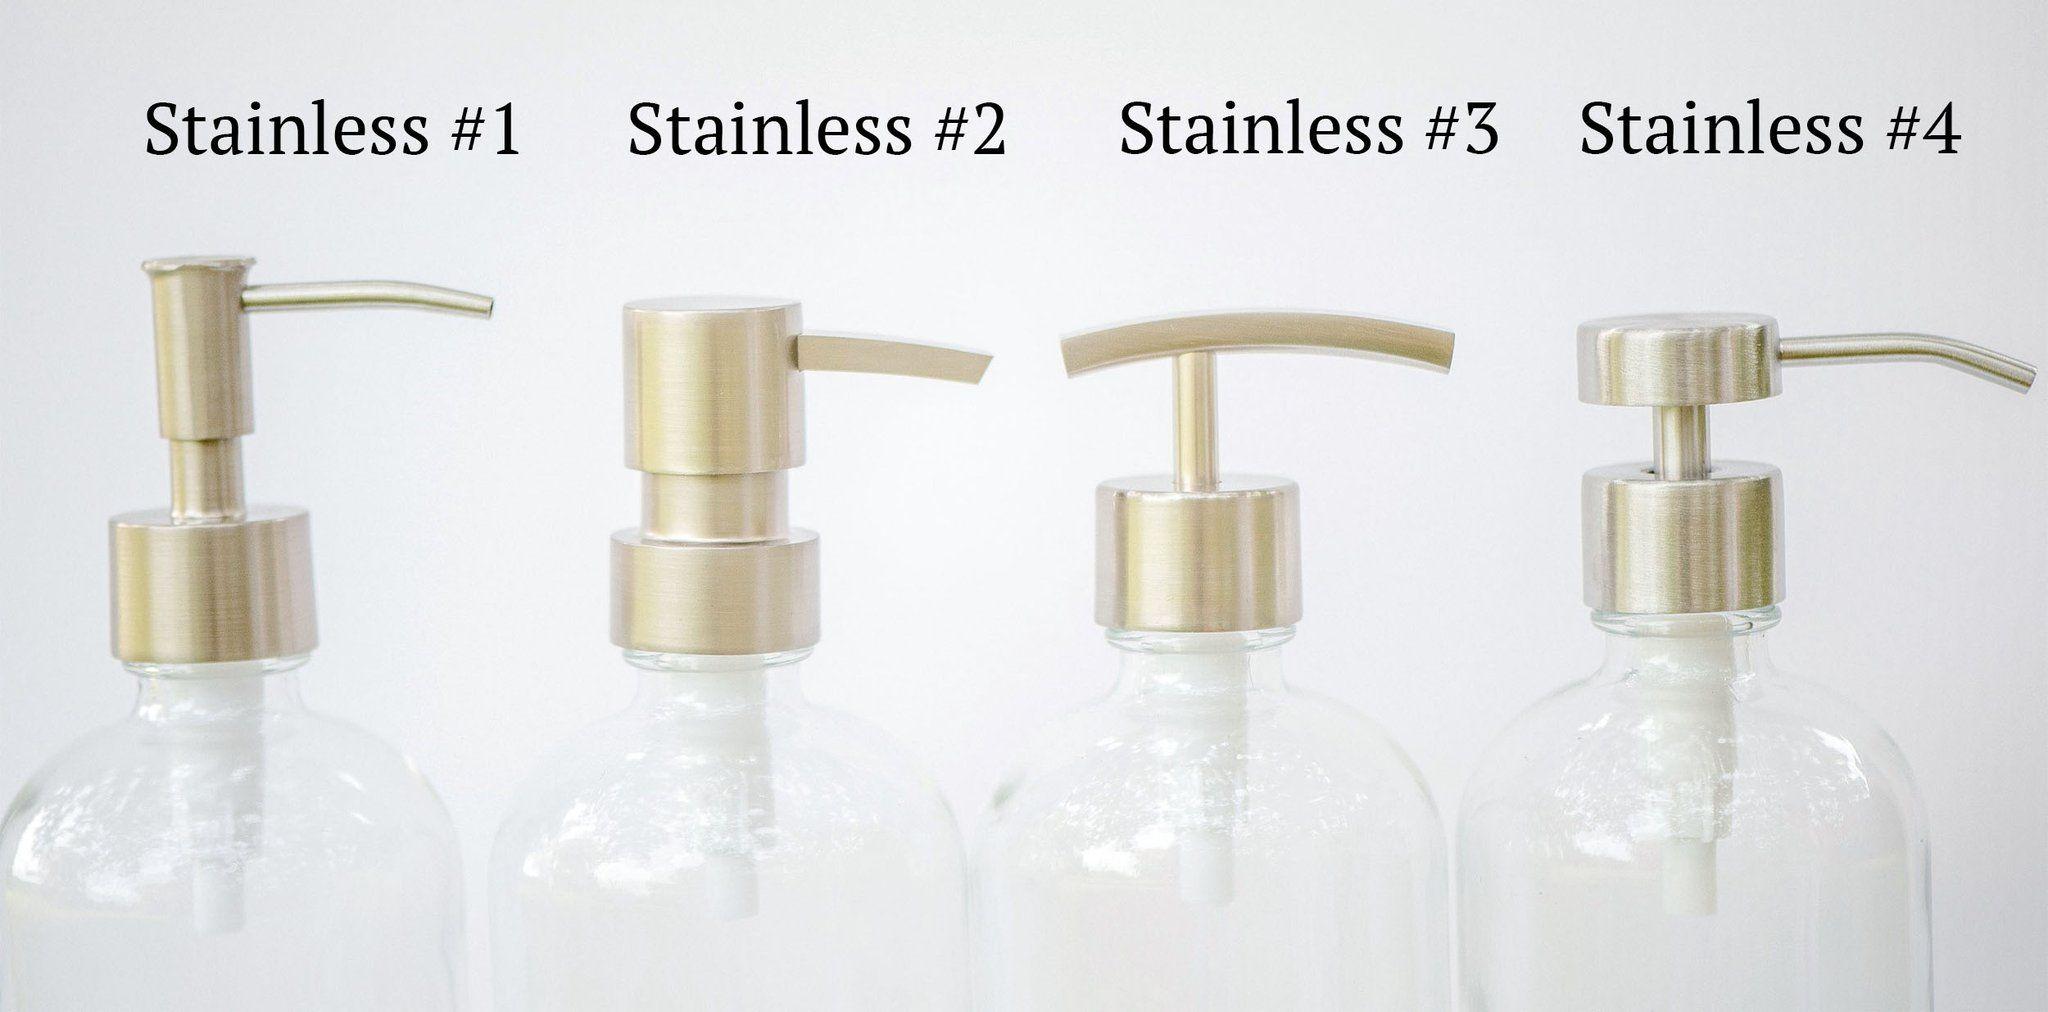 Stainless Replacement Pump Soap Dispenser Soap Pump Dispenser